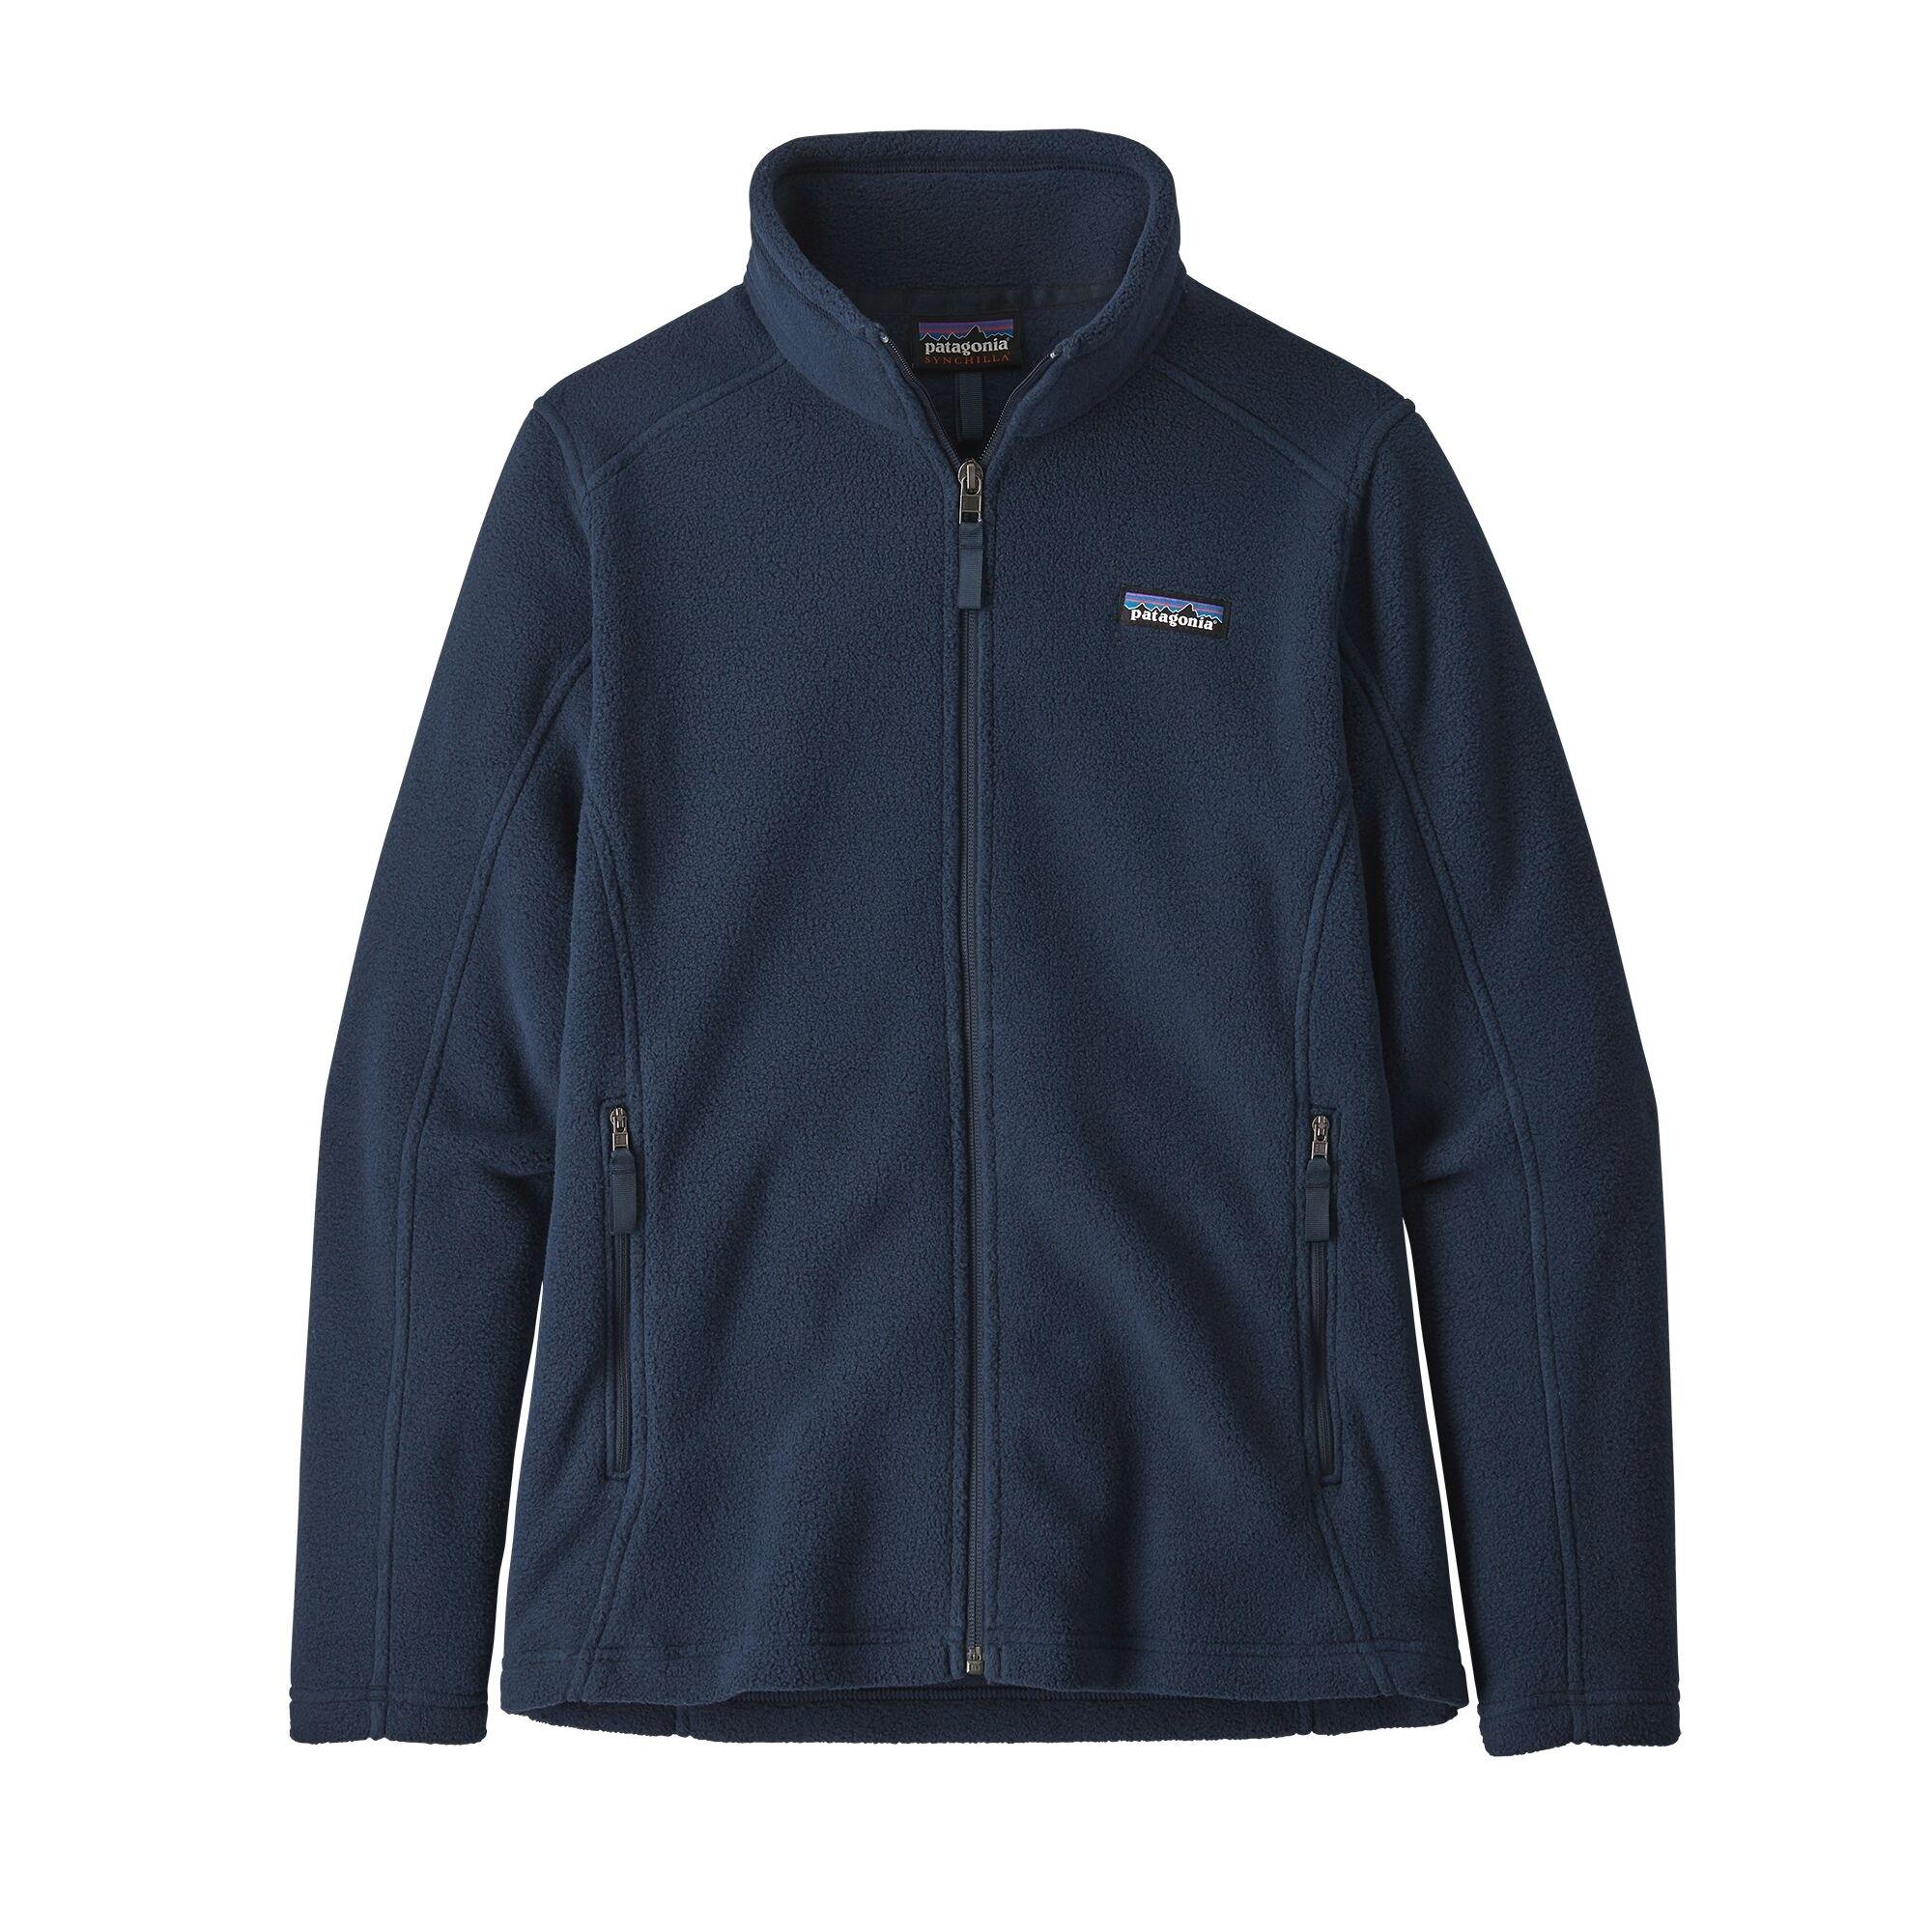 Patagonia Women's Classic Synchilla Fleece Jacket : New Navy